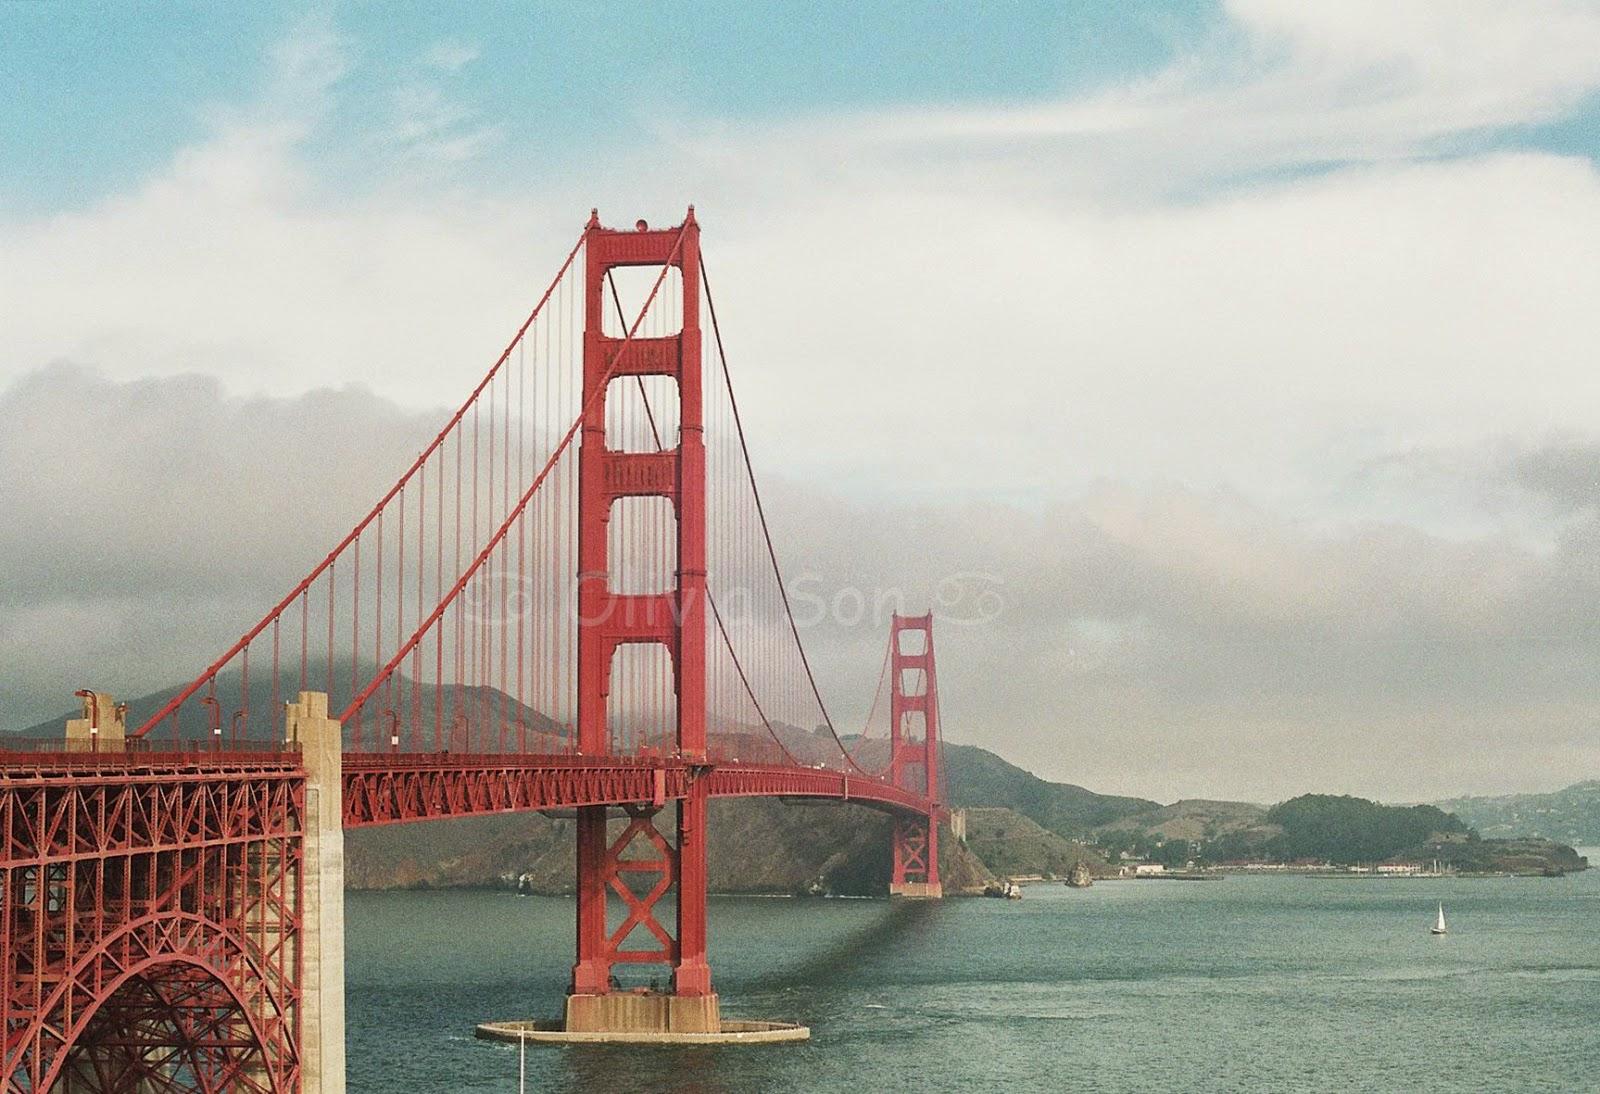 golden gate bridge, san francisco, californie, usa